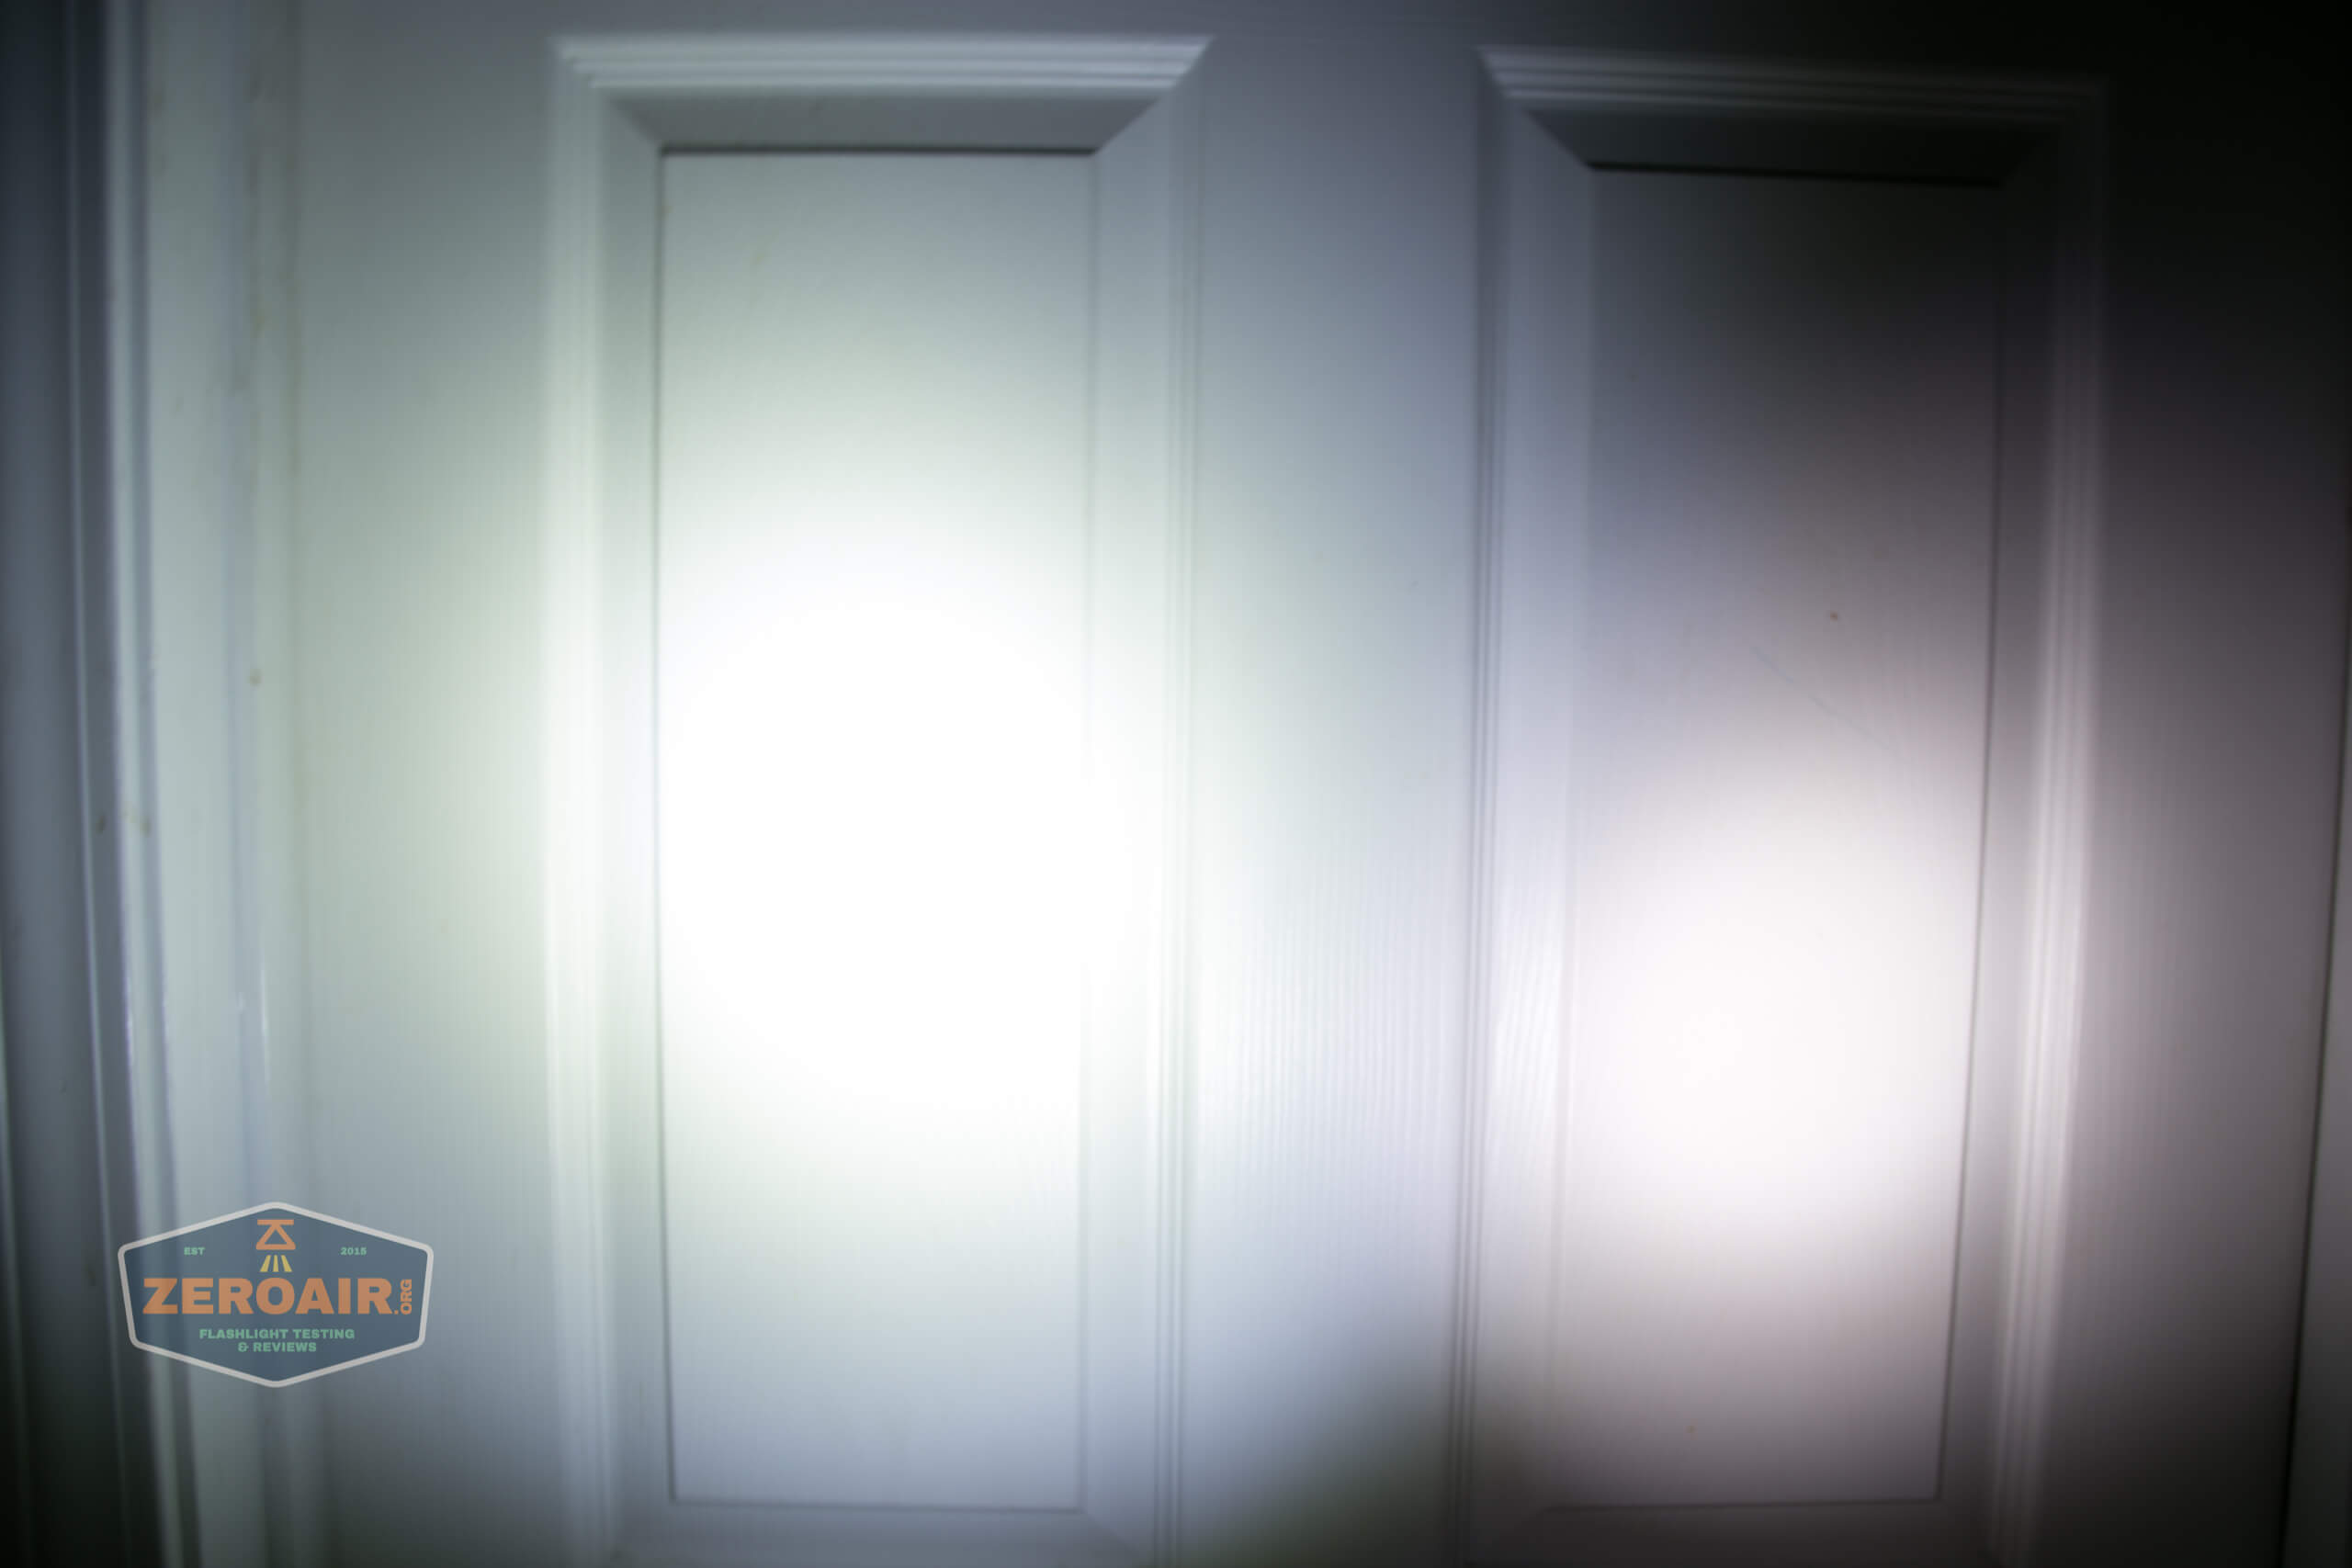 freasygears cyansky m3 titanium pocket flashlight beamshot door 3